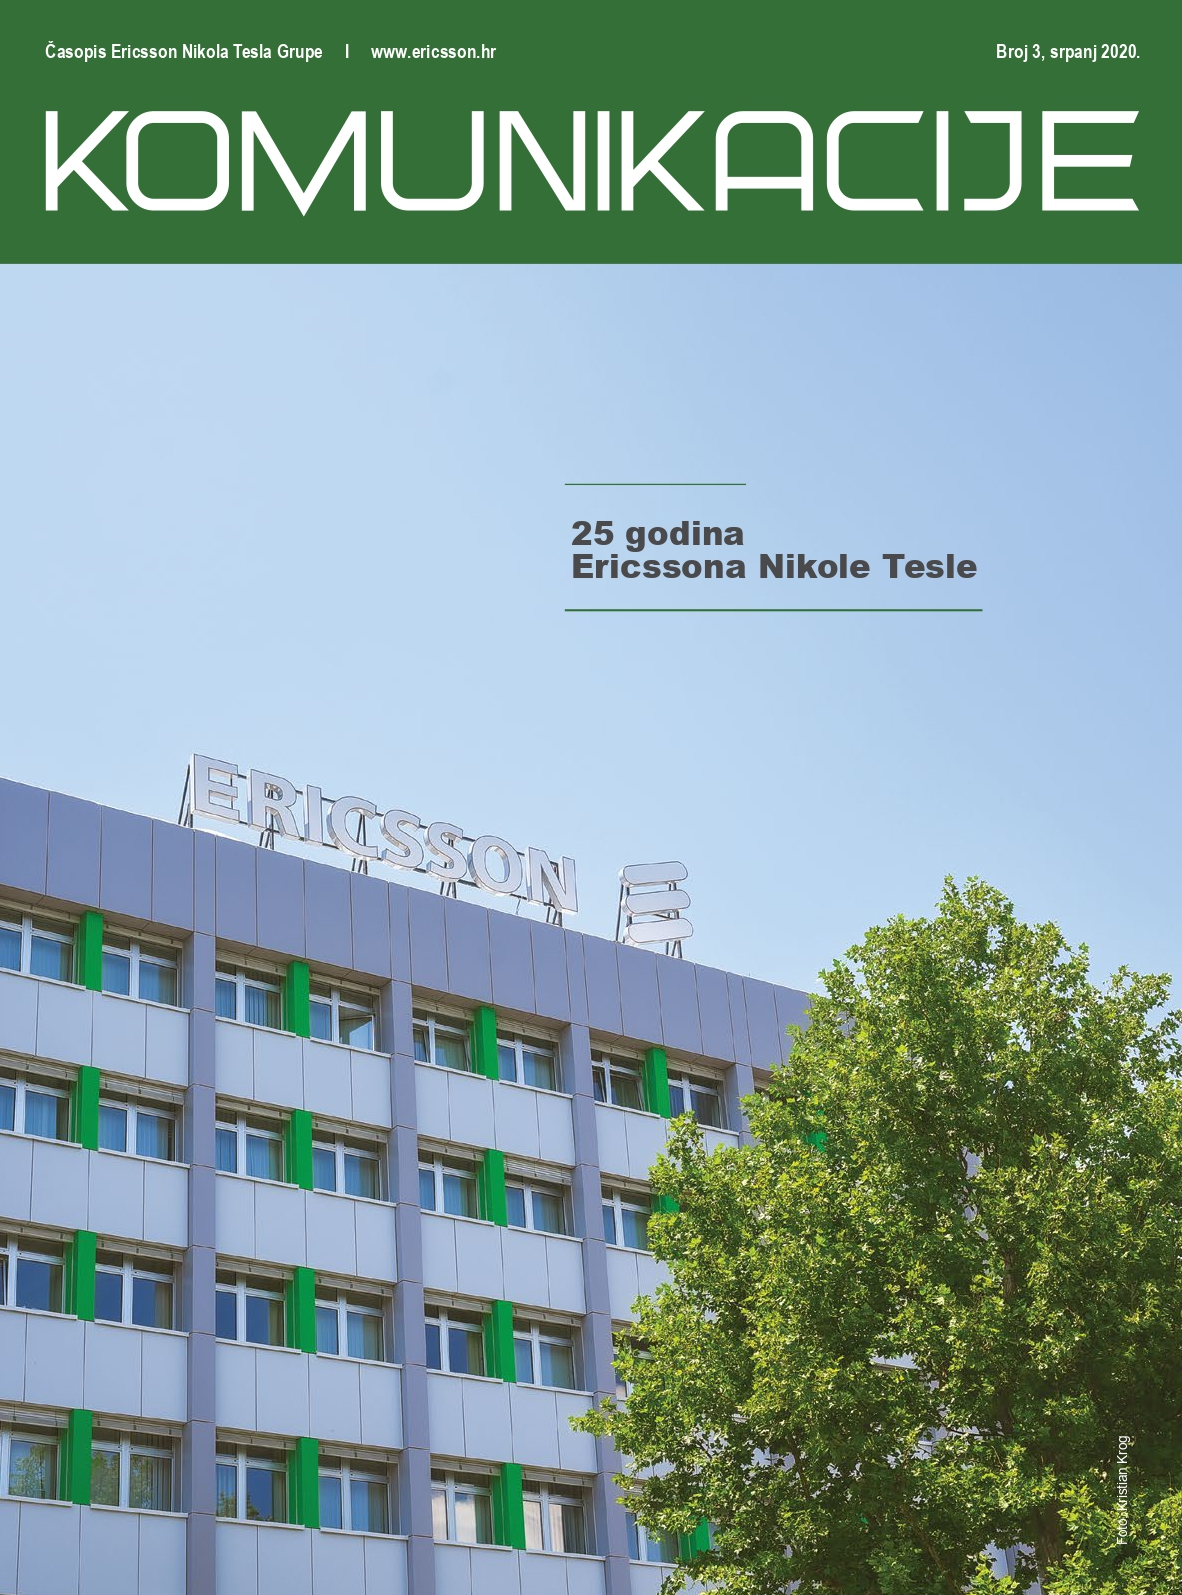 Časopis Ericsson Nikola Tesla Grupe - Broj 3, srpanj 2020.